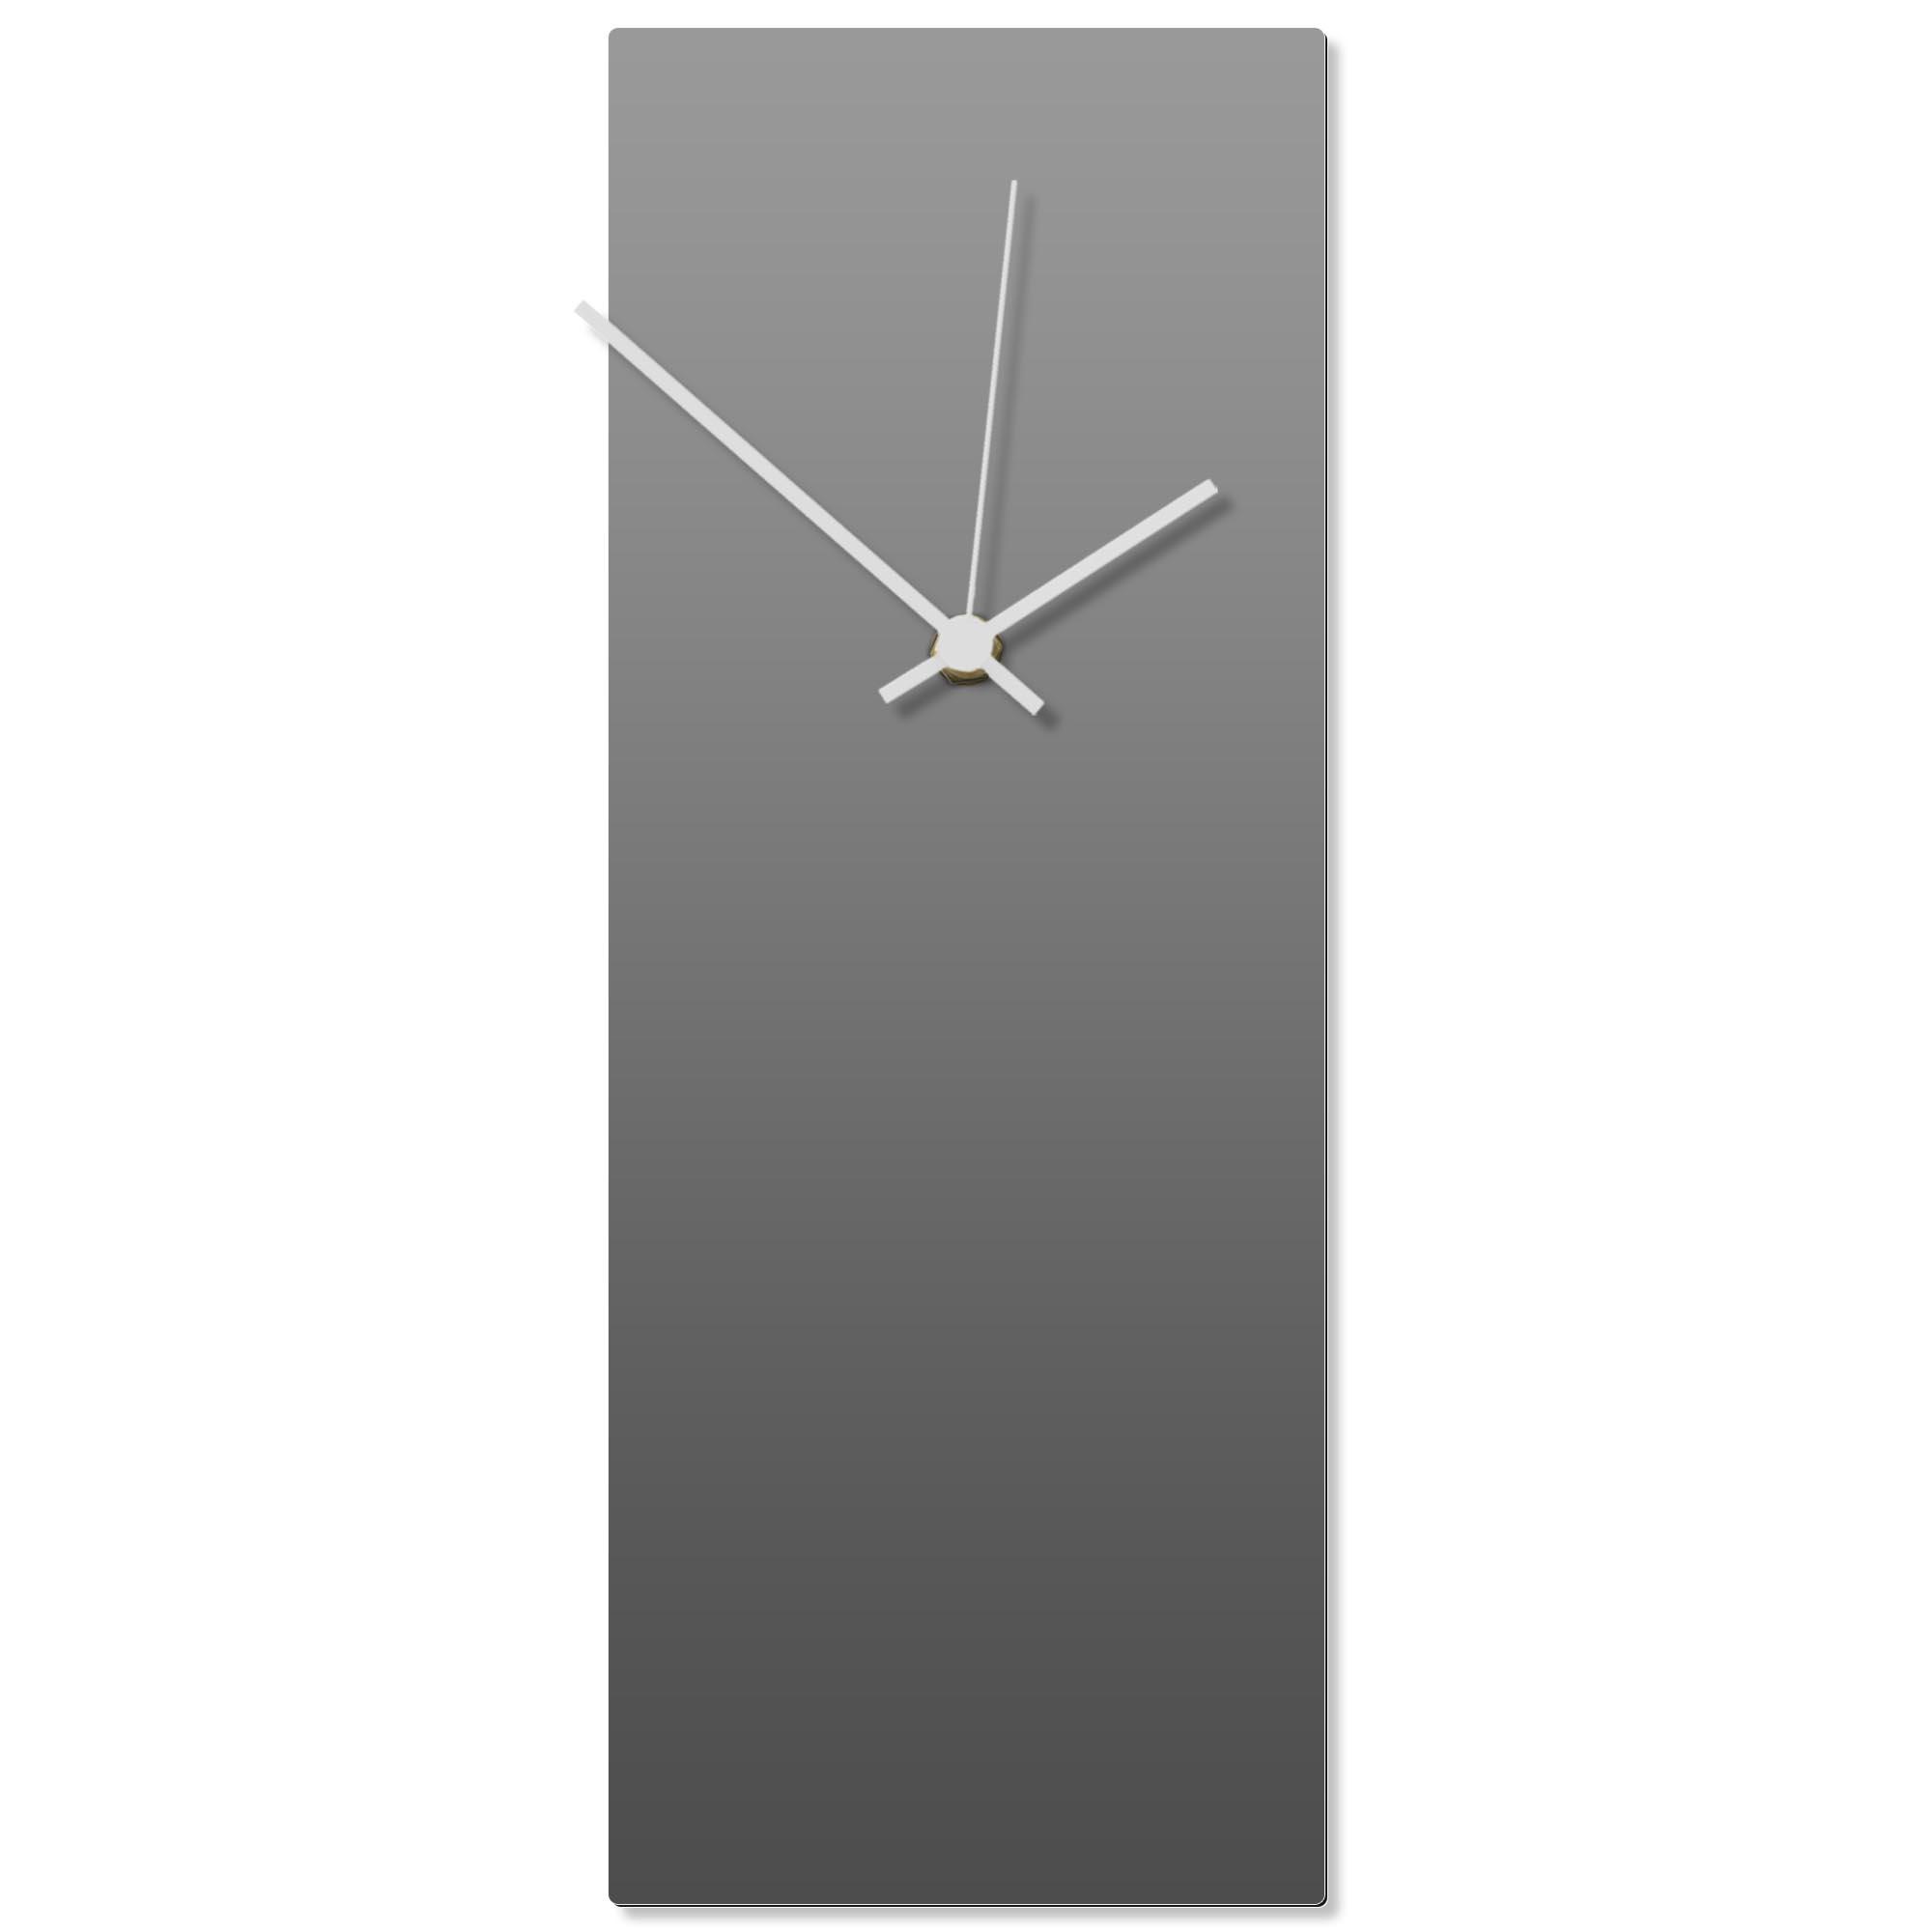 Grayout White Clock 6x16in. Aluminum Polymetal